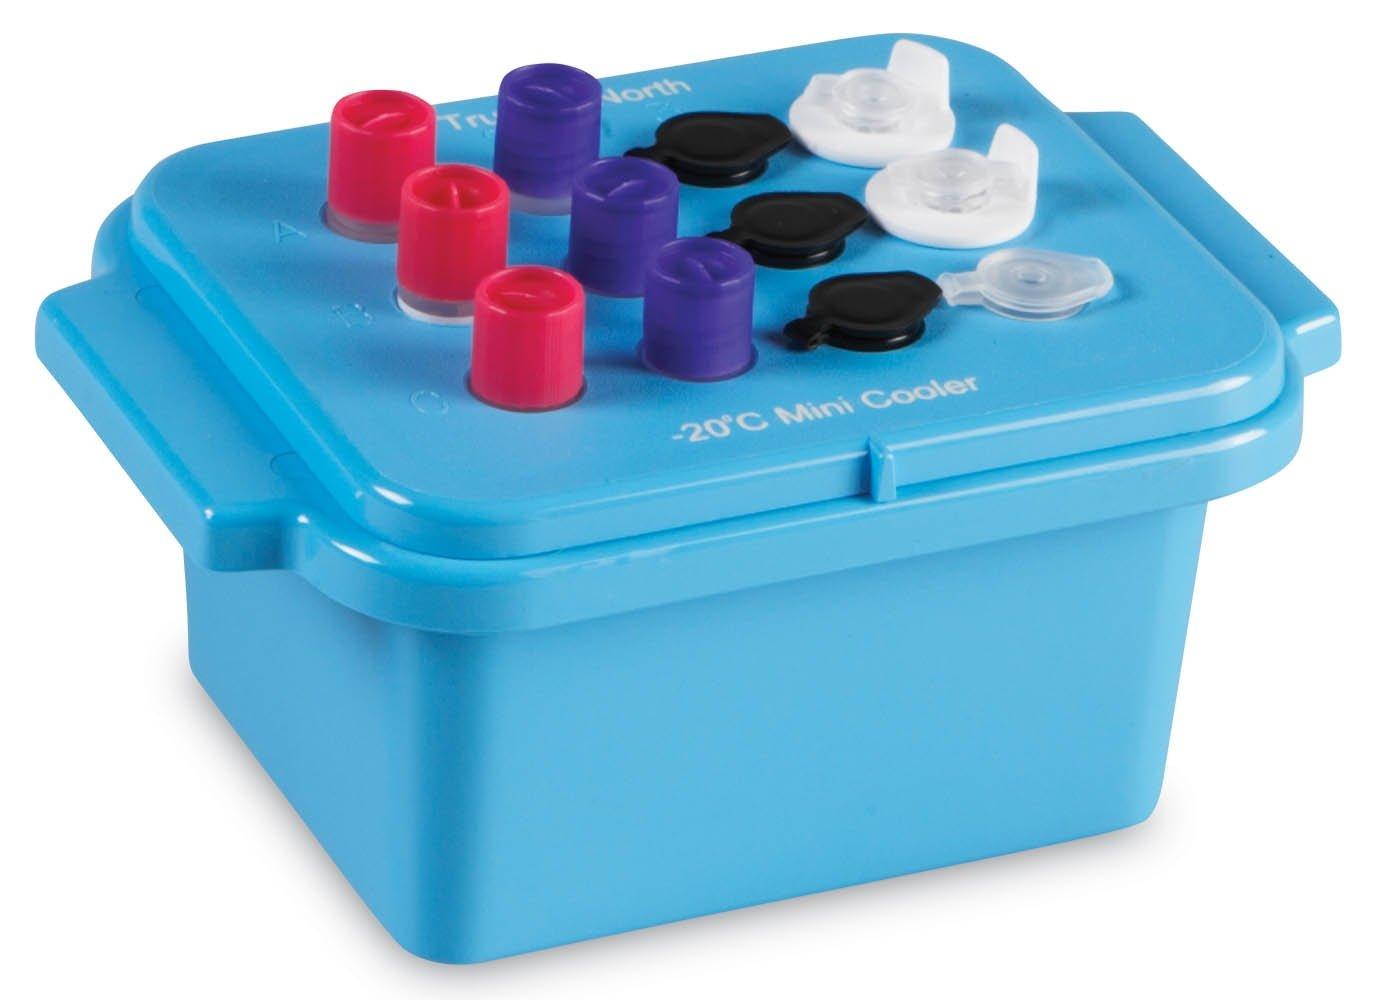 True North Blue Mini Cooler -20 Degrees C - Clear Lid - 12 x 0.5-2.0 mL